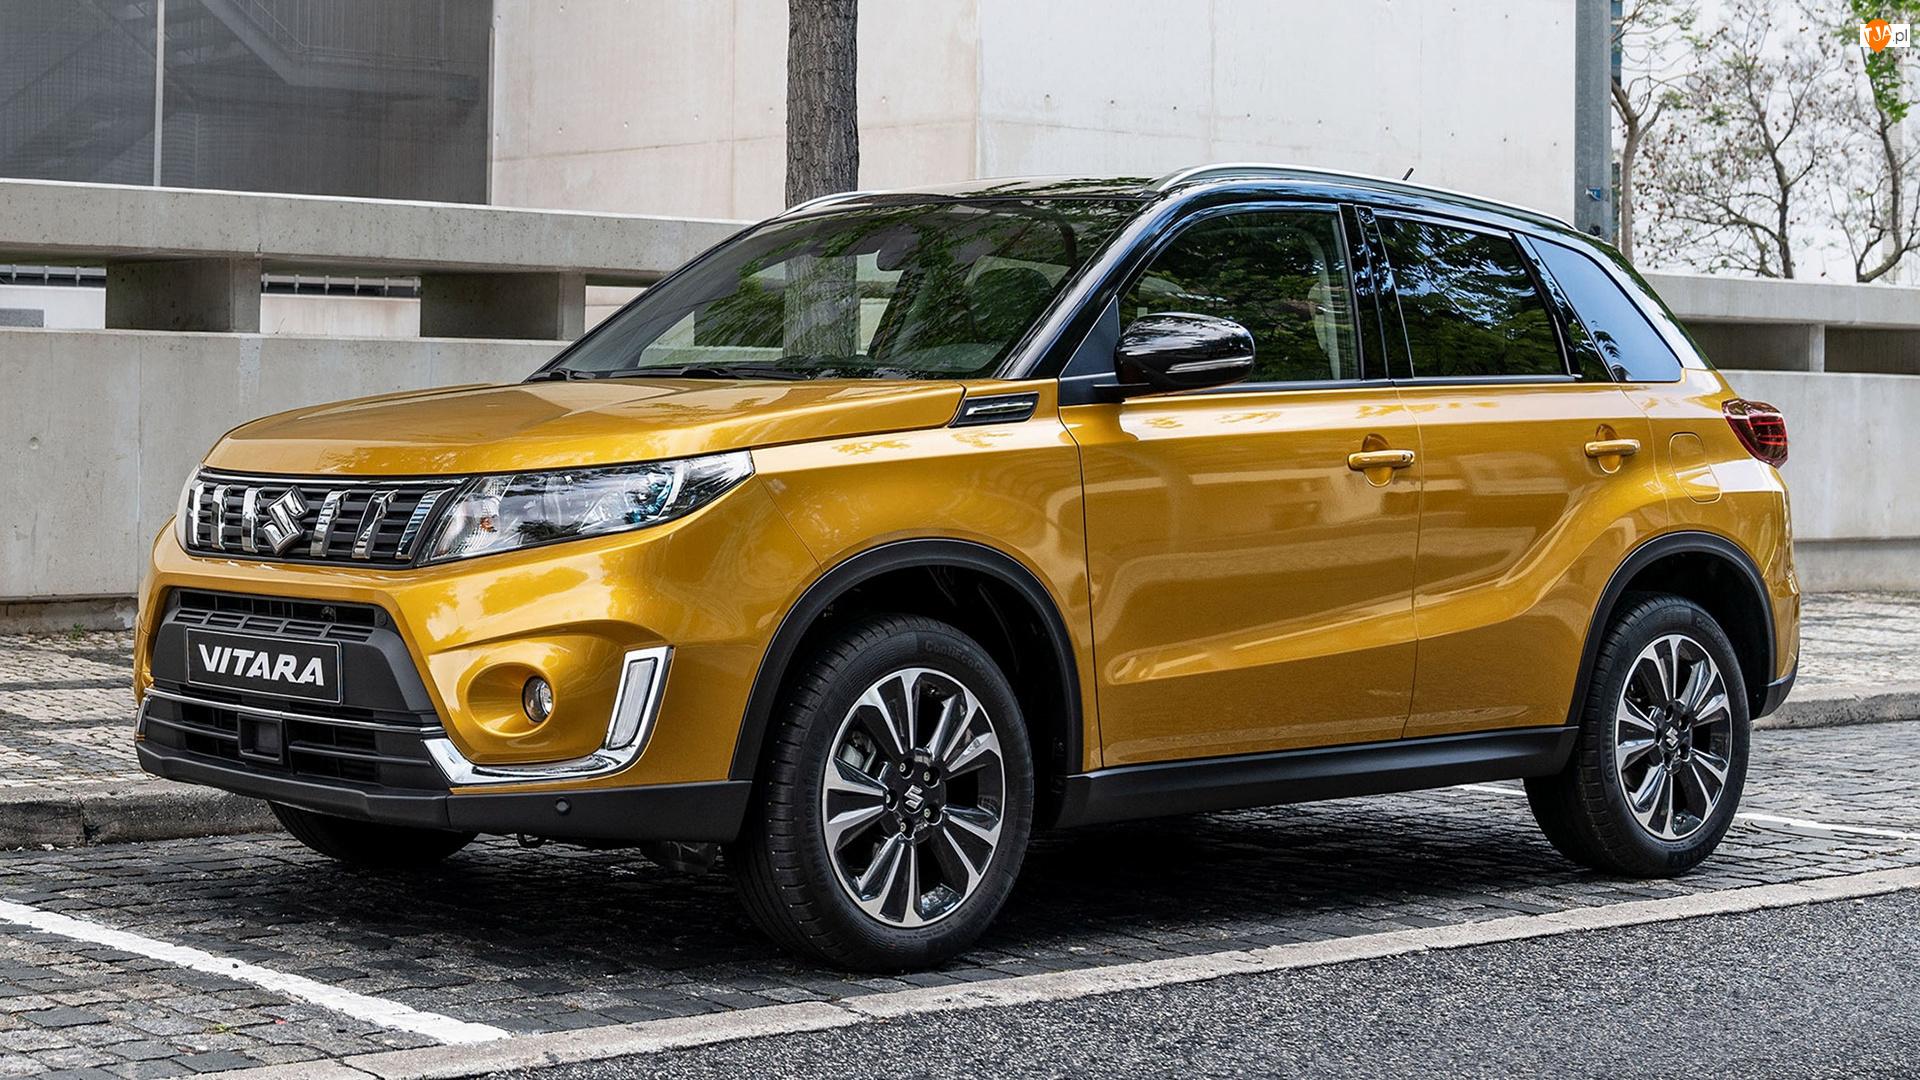 Suzuki Vitara, Żółty